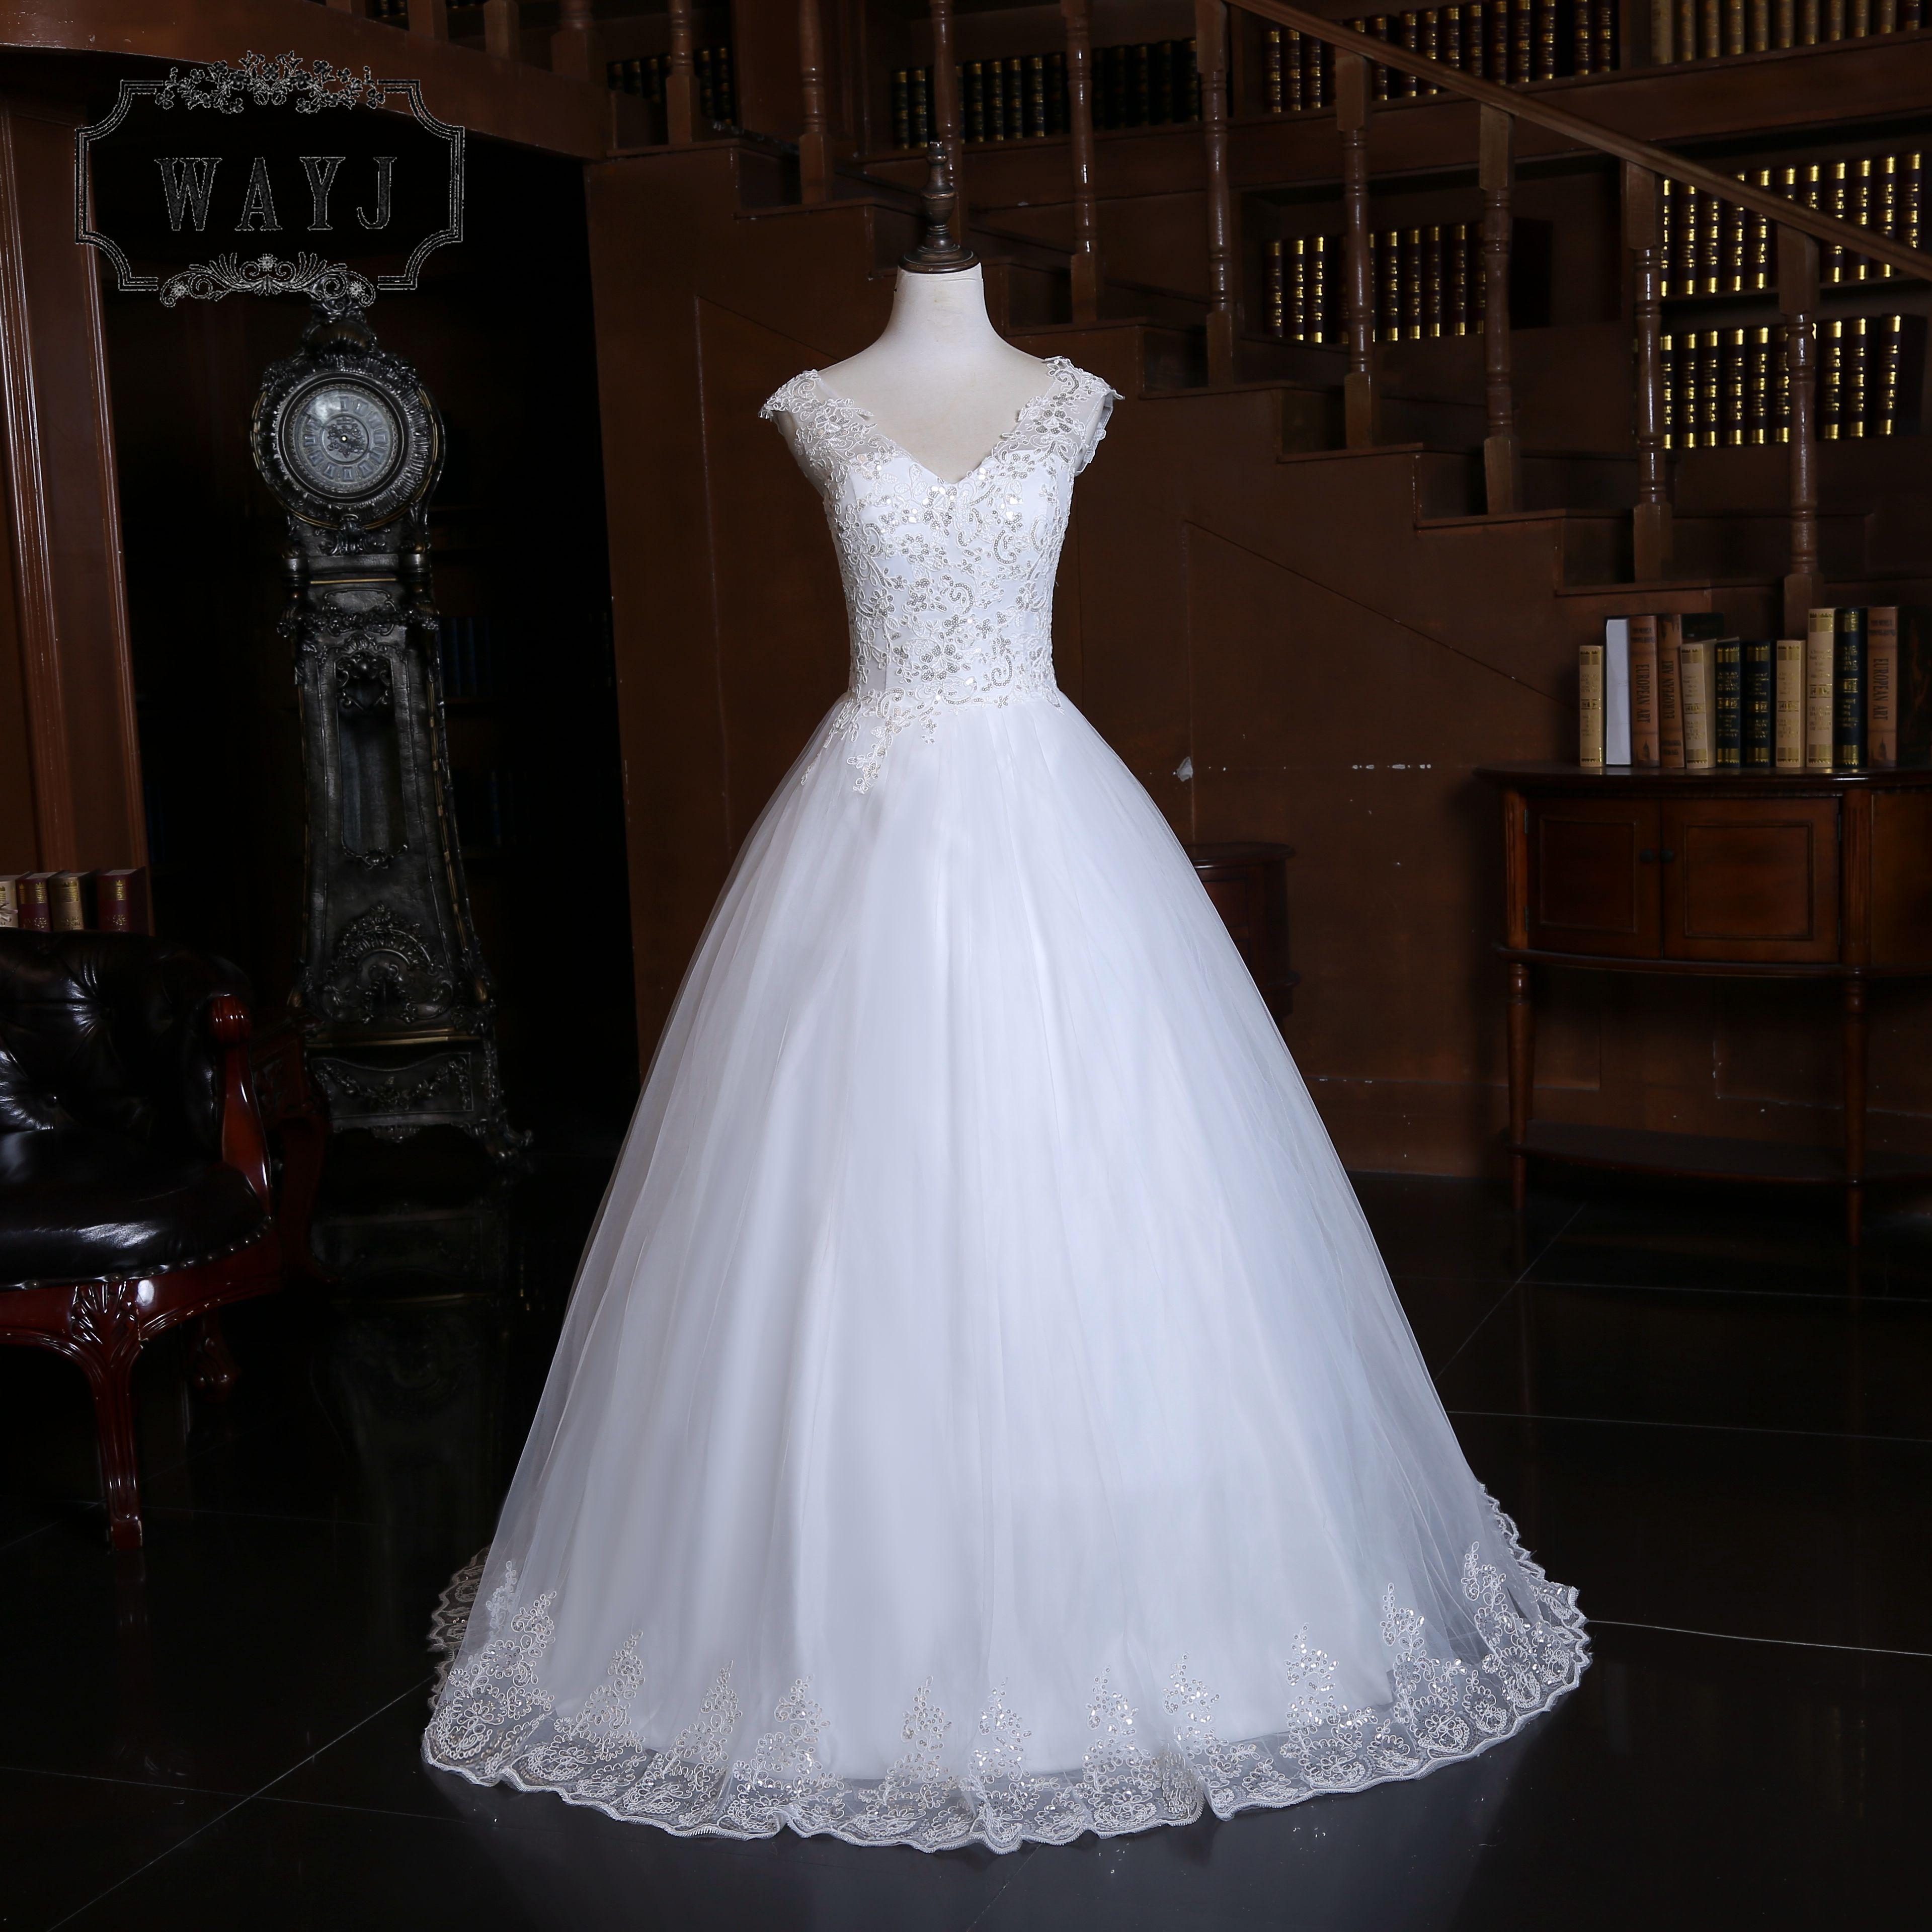 New Arrive V-neck Sequins Ball Gown Wedding Dress 2020 Nice Princess Wedding Gowns Shiny Appliques Custom Vestido De Noiva 2020